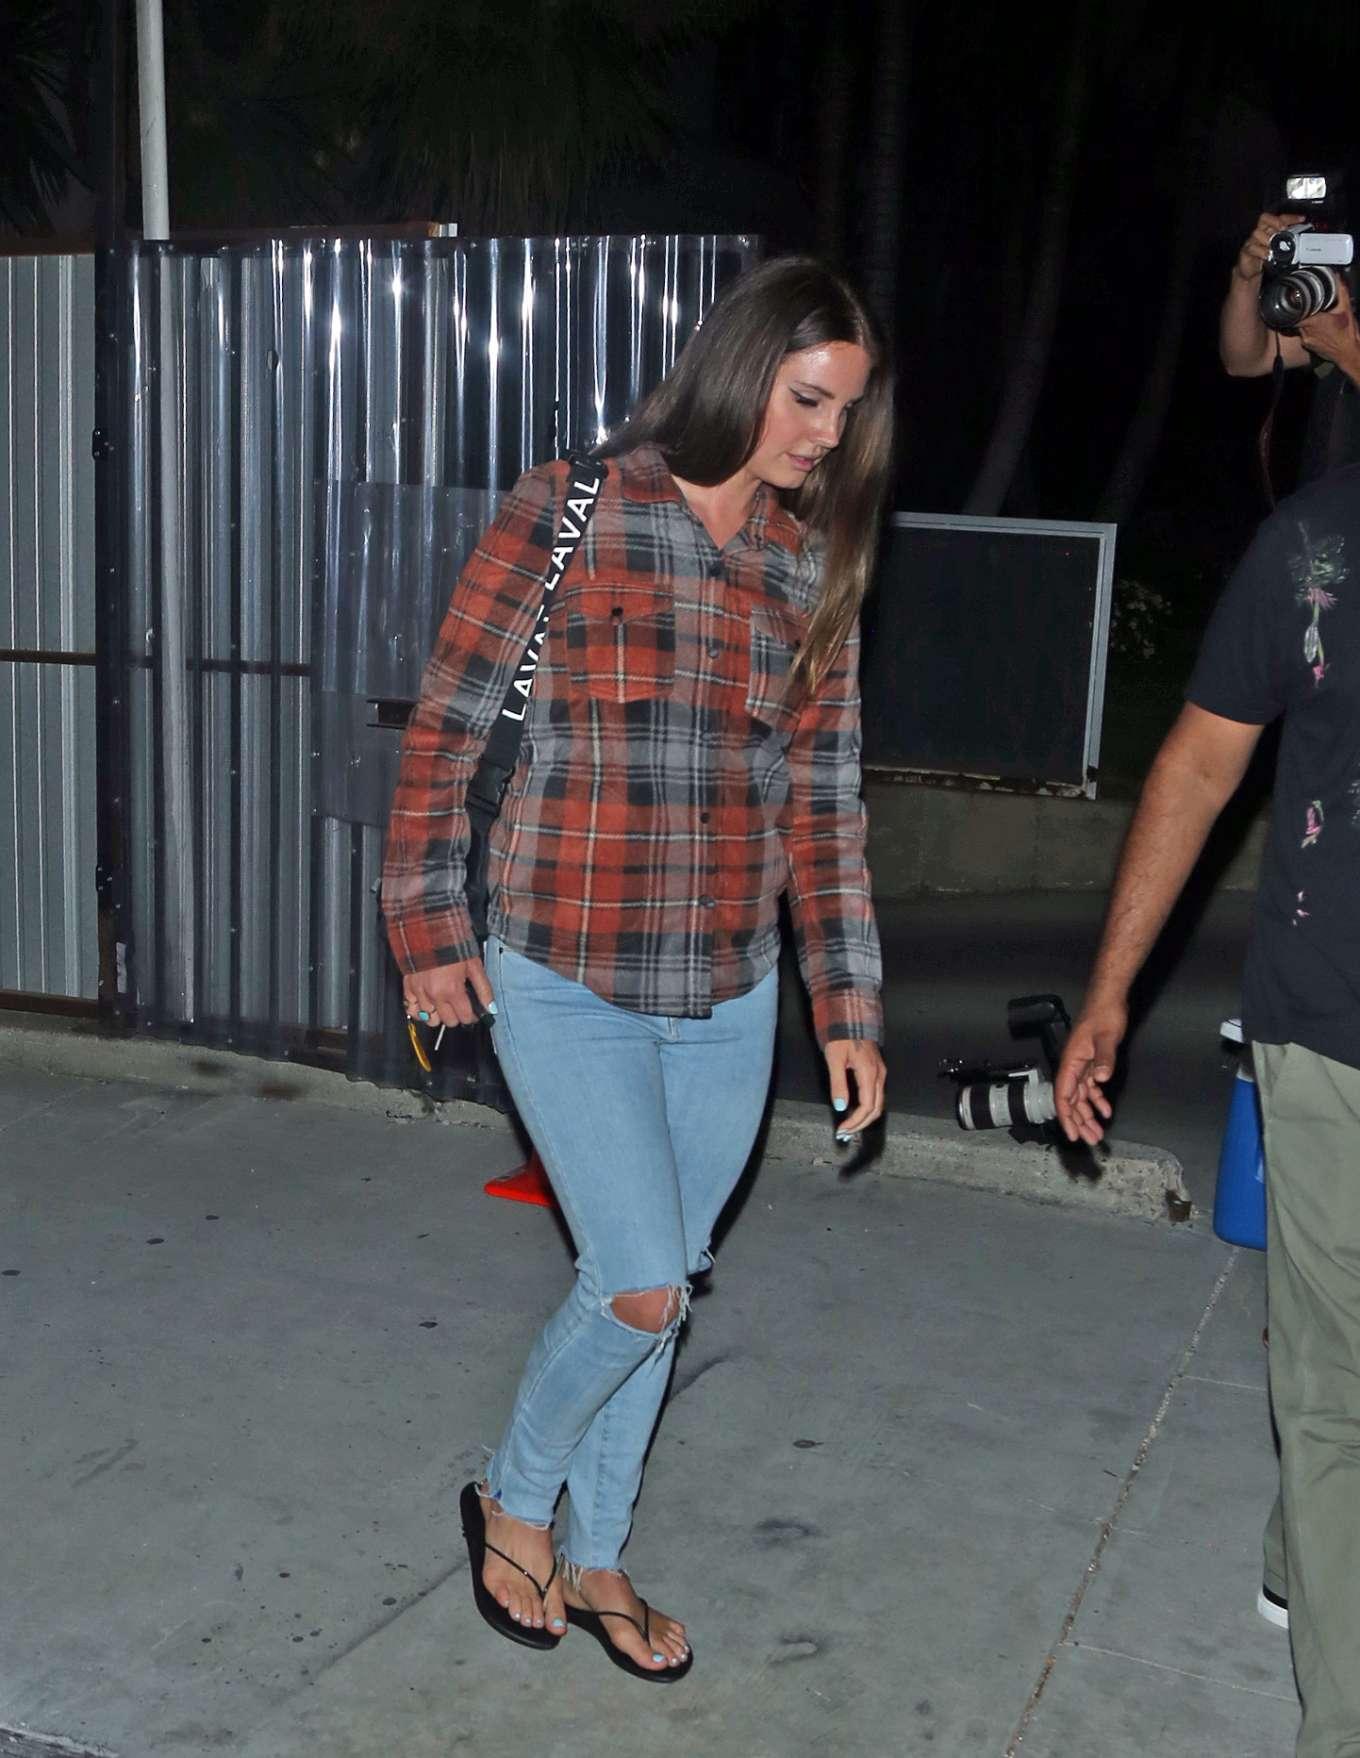 Lana Del Rey 2019 : Lana Del Rey seen leaving church service tonight in Beverly Hills-02